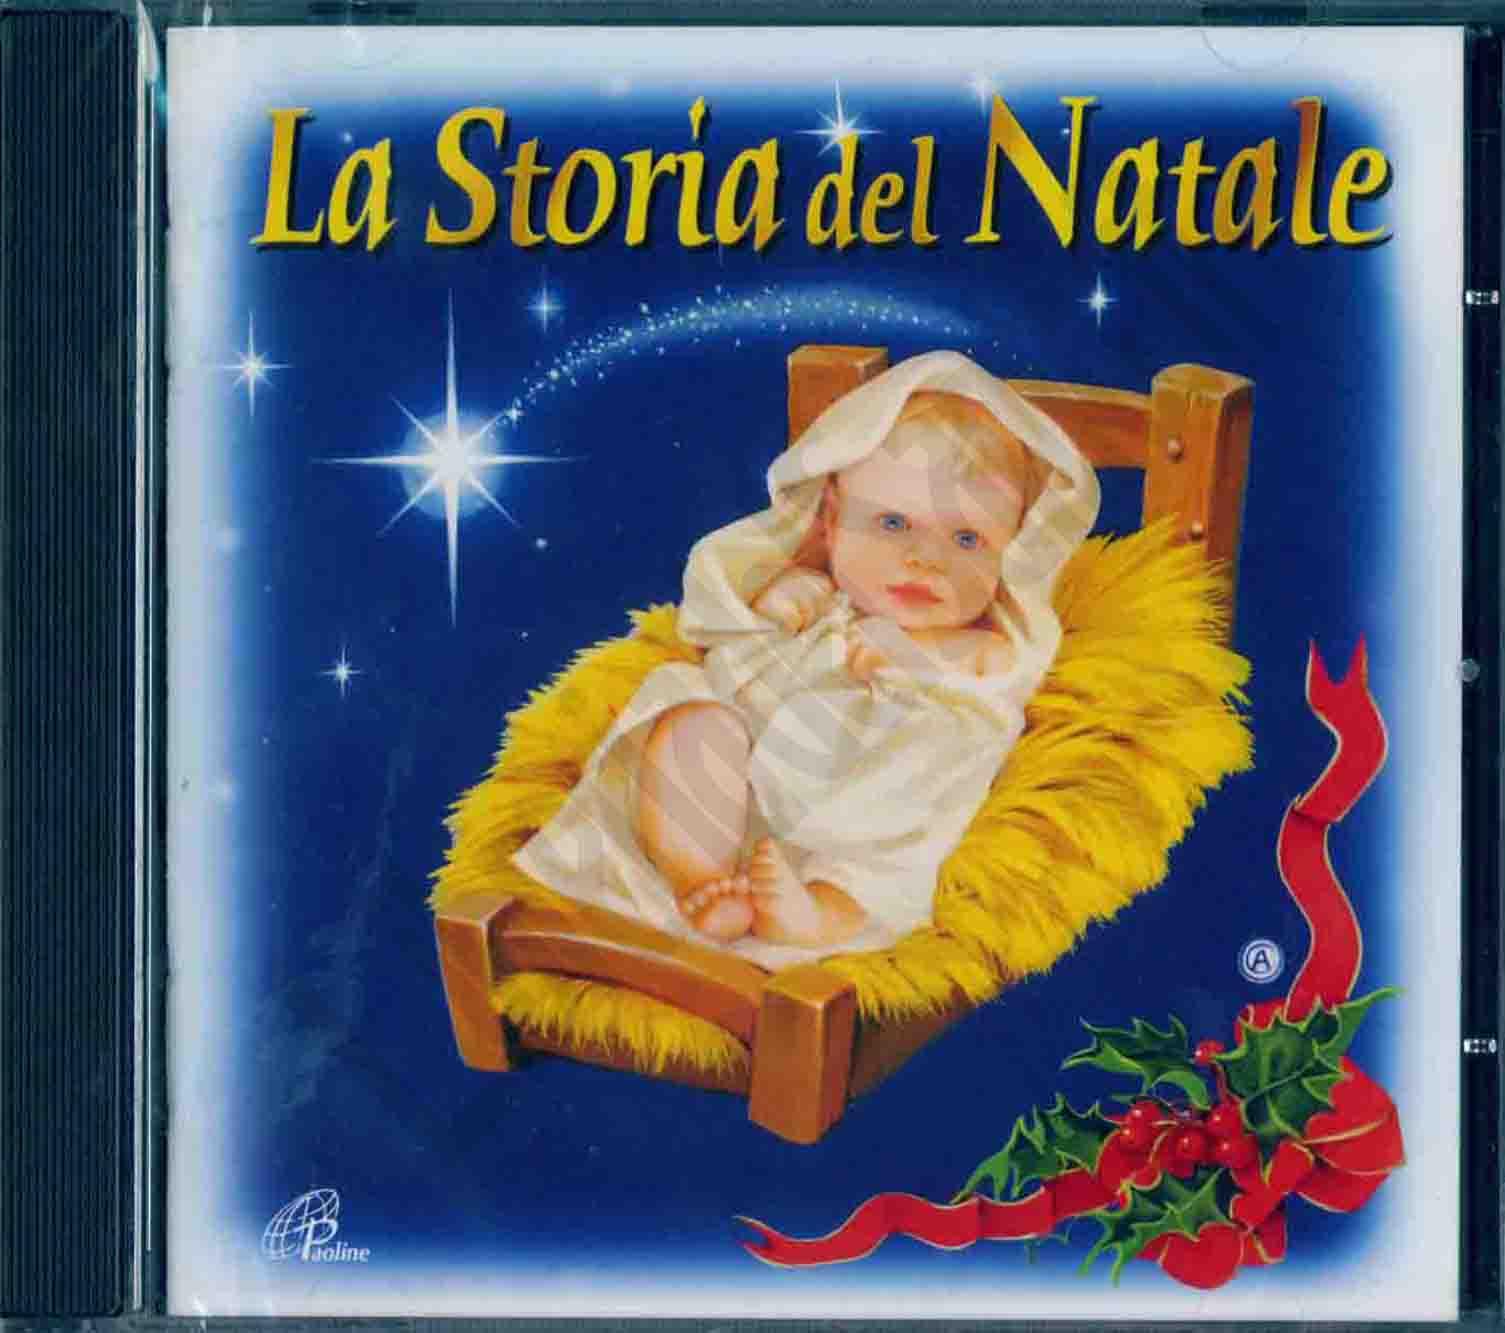 La Storia Del Natale Cd Musica Natalizia Libreriadelsantoit